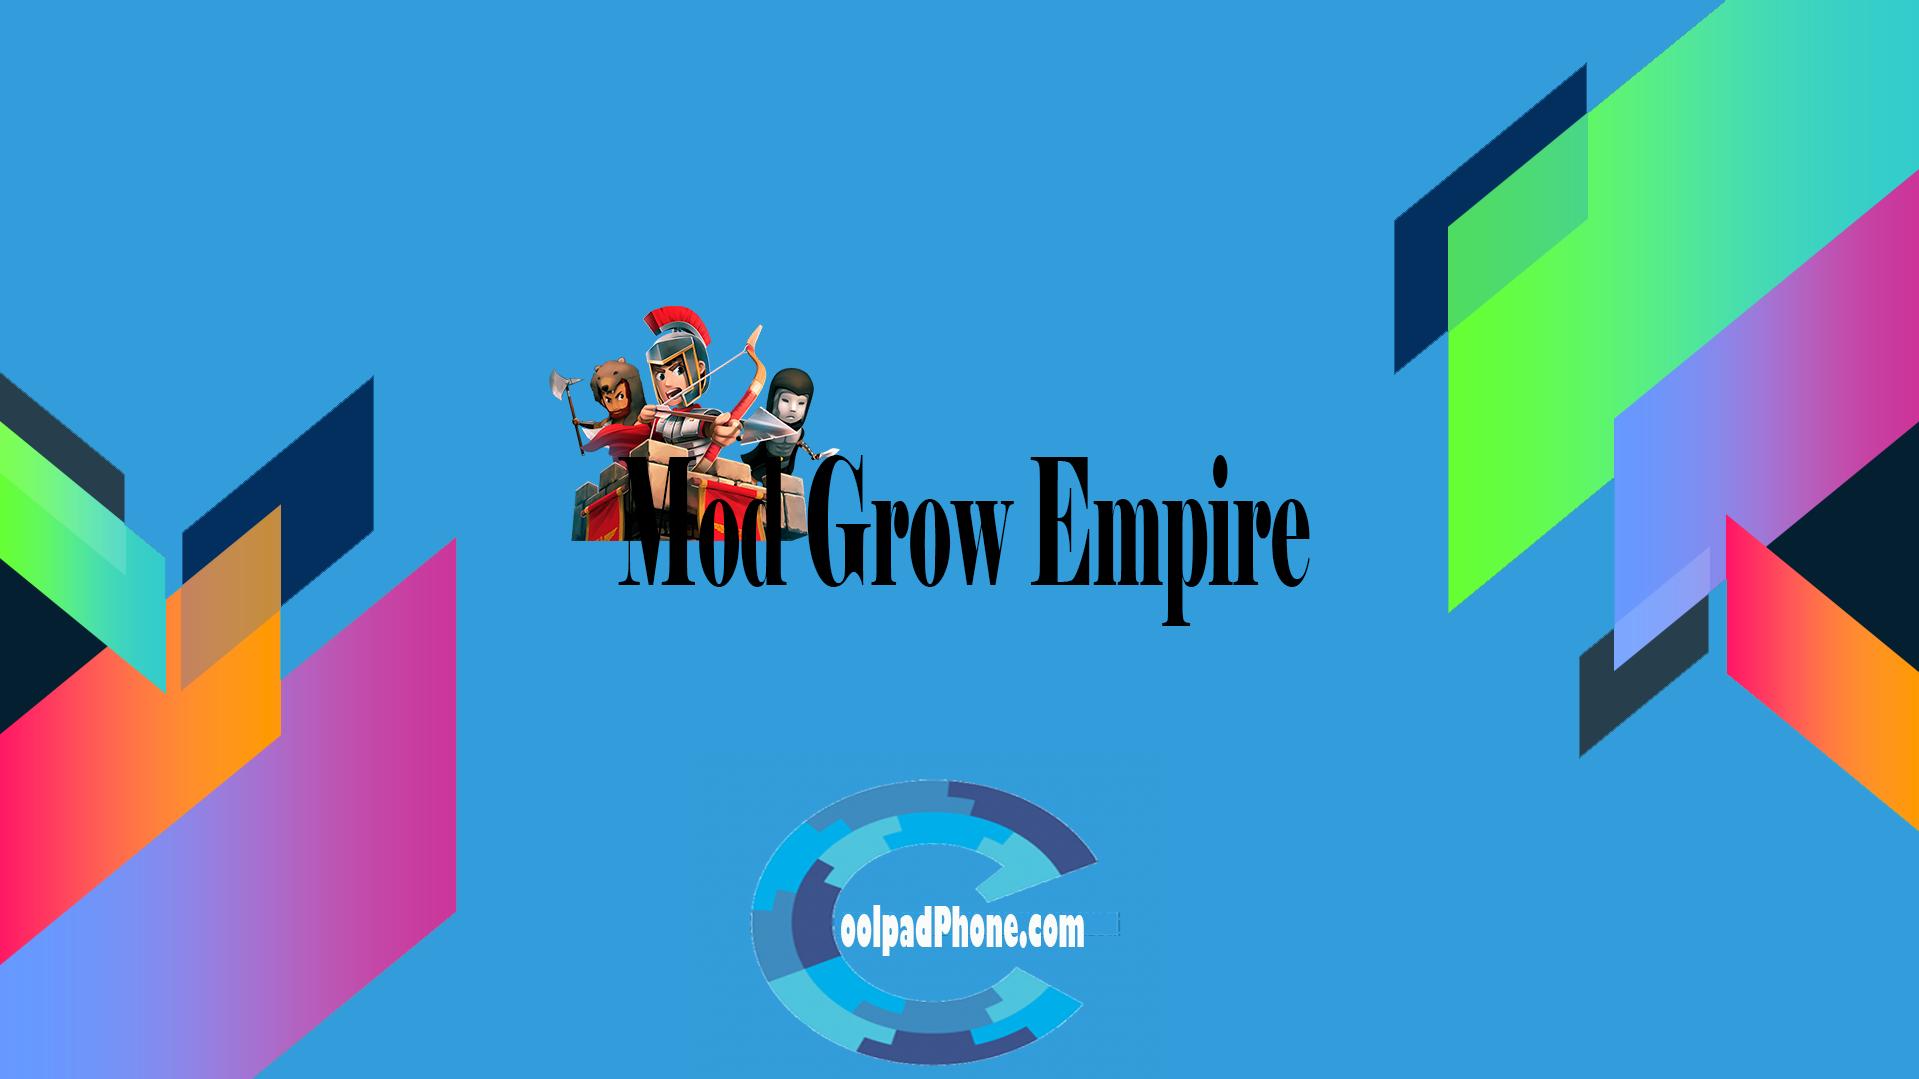 Mod Grow Empire